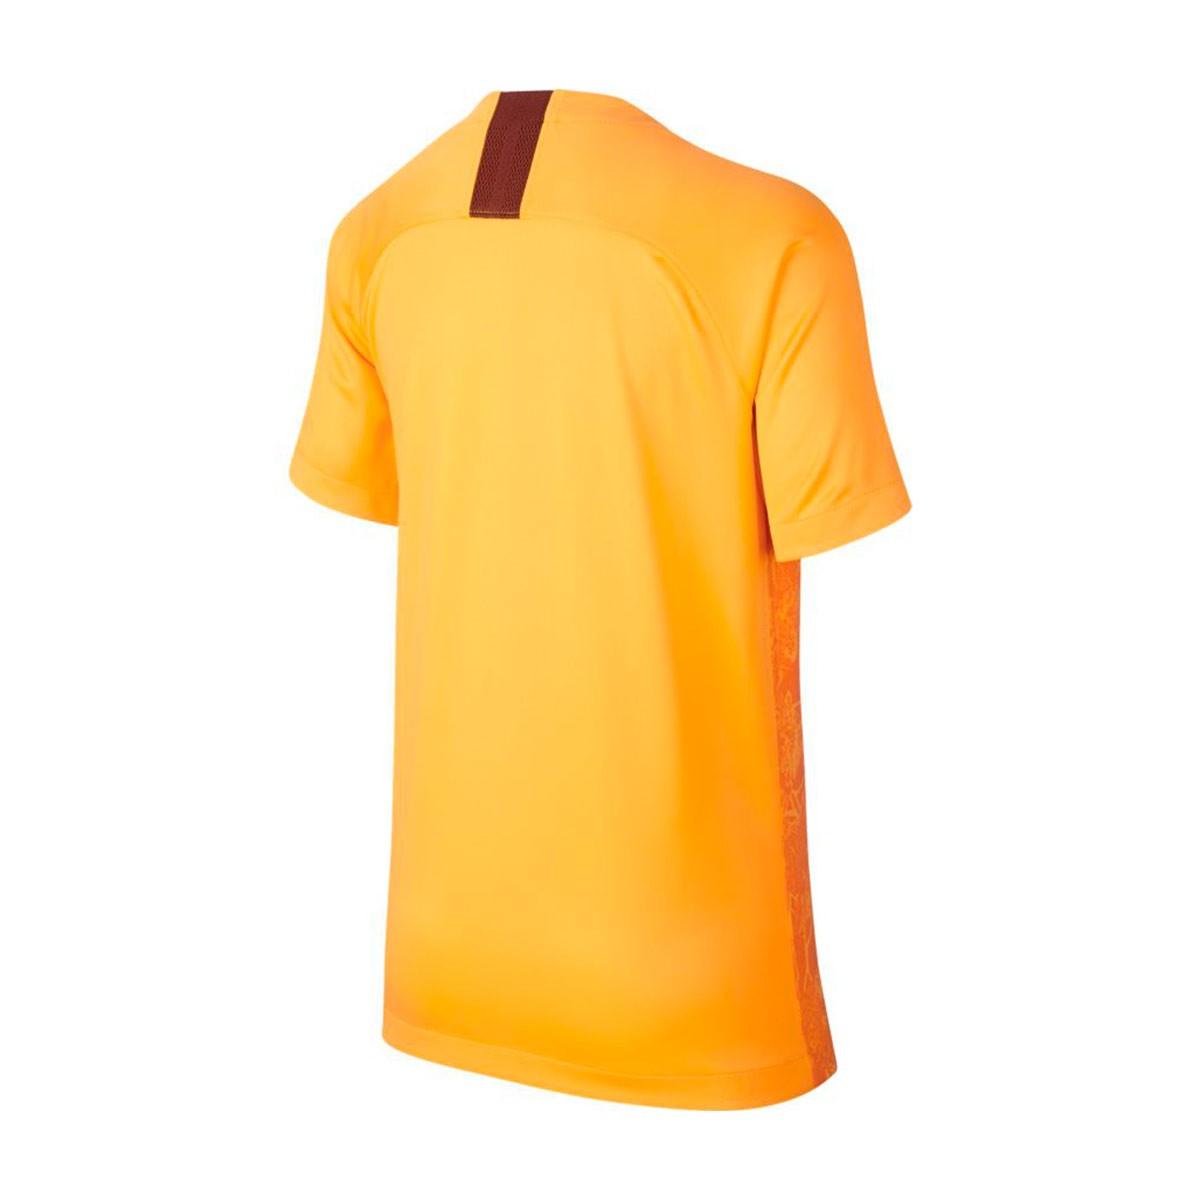 de0324331 Jersey Nike Kids AS Roma Stadium 2018-2019 Third University gold ...